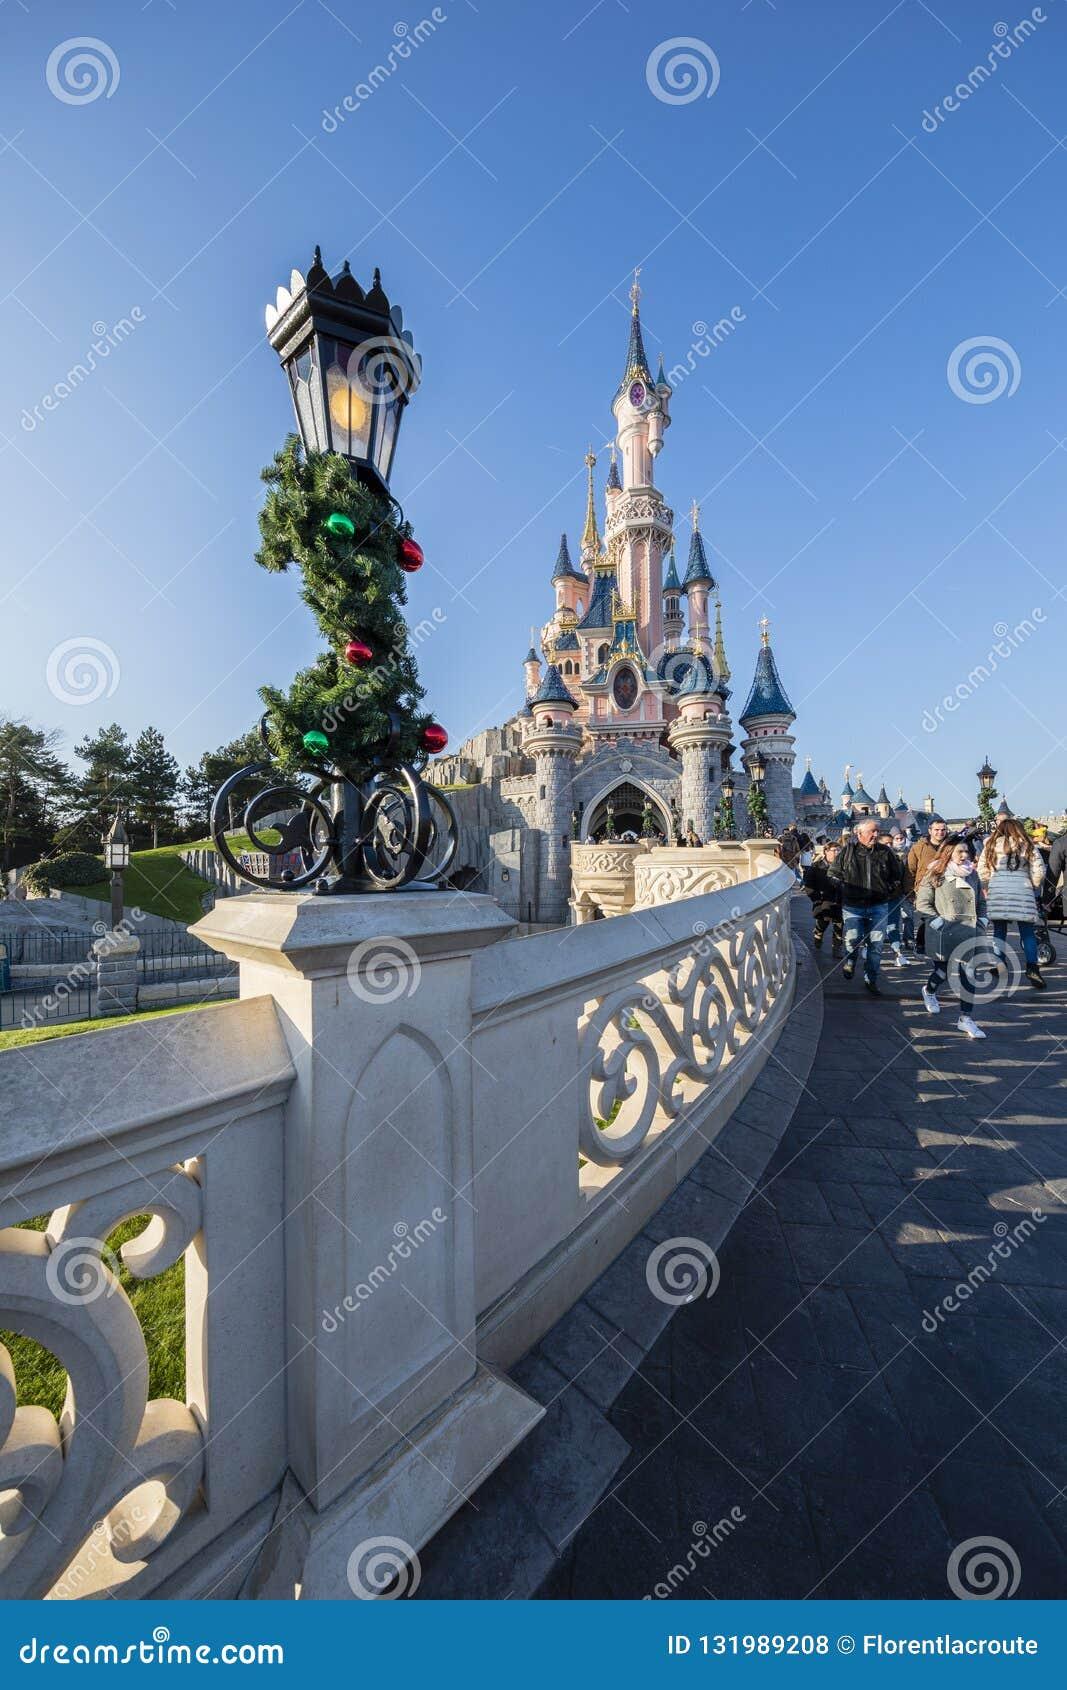 Disneyland Παρίσι, Γαλλία, το Νοέμβριο του 2018: Castle της ομορφιάς ύπνου